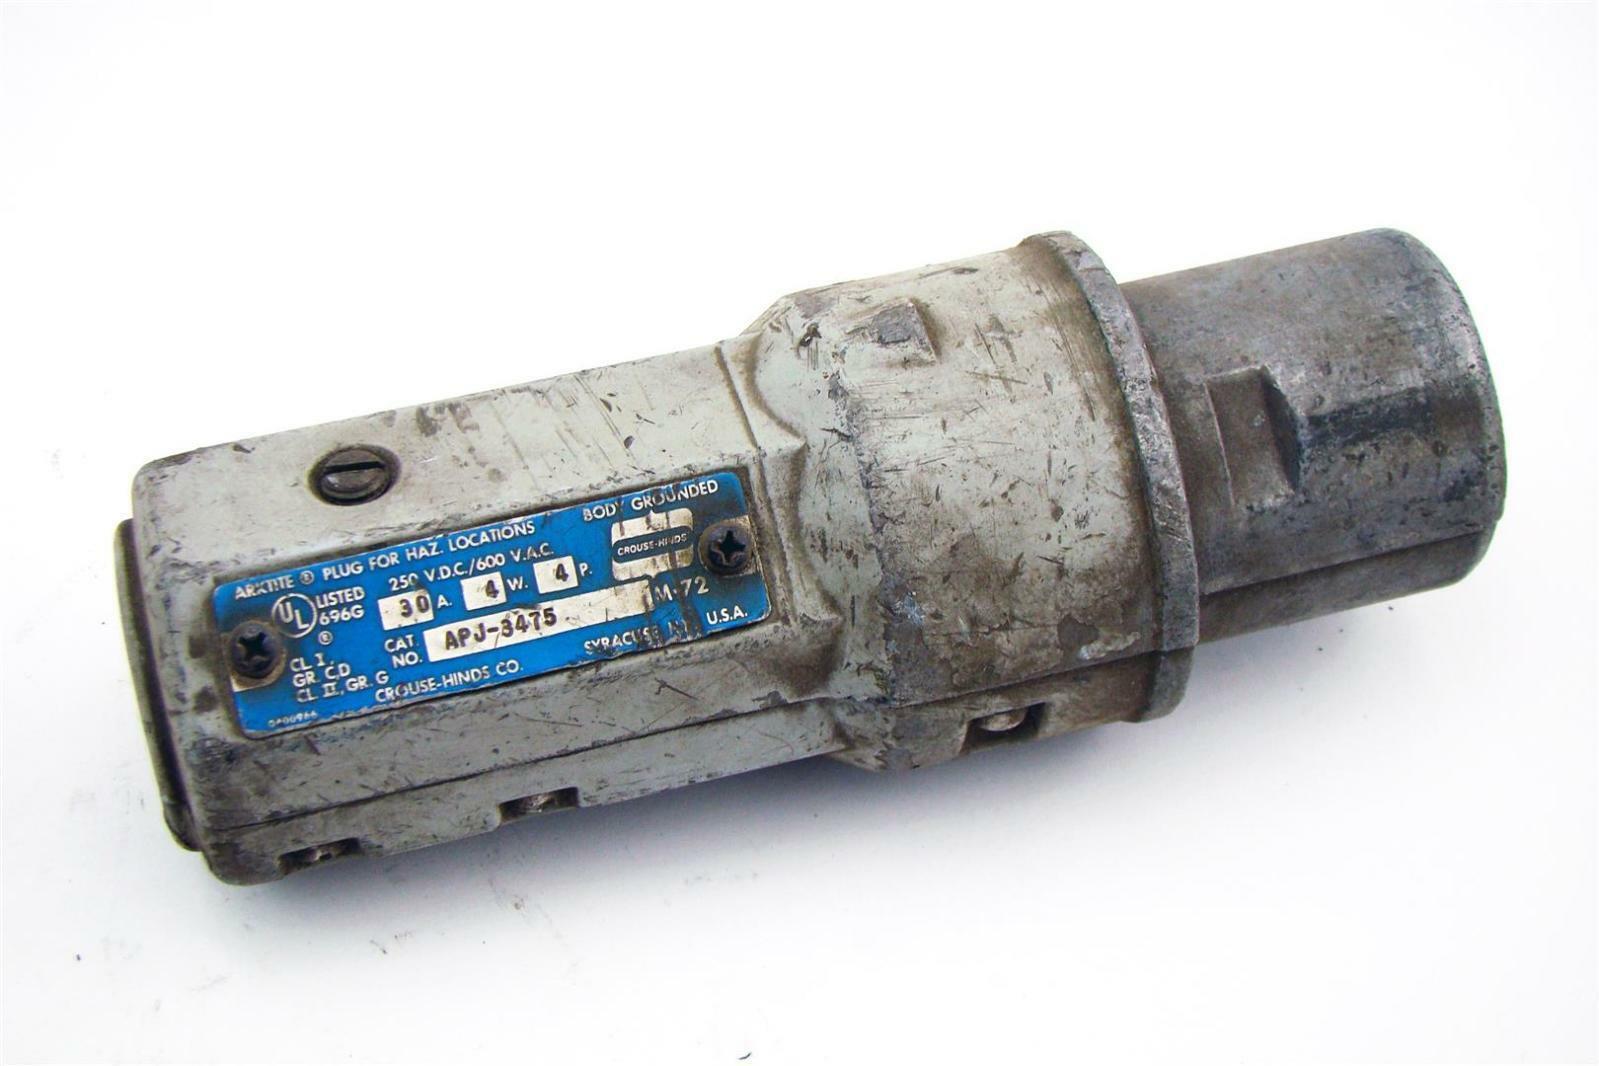 COOPER CROUSE HINDS ARKTITE HEAVY DUTY PLUG 600 VAC 30 AMP 4-POLE NPJ3484 30A